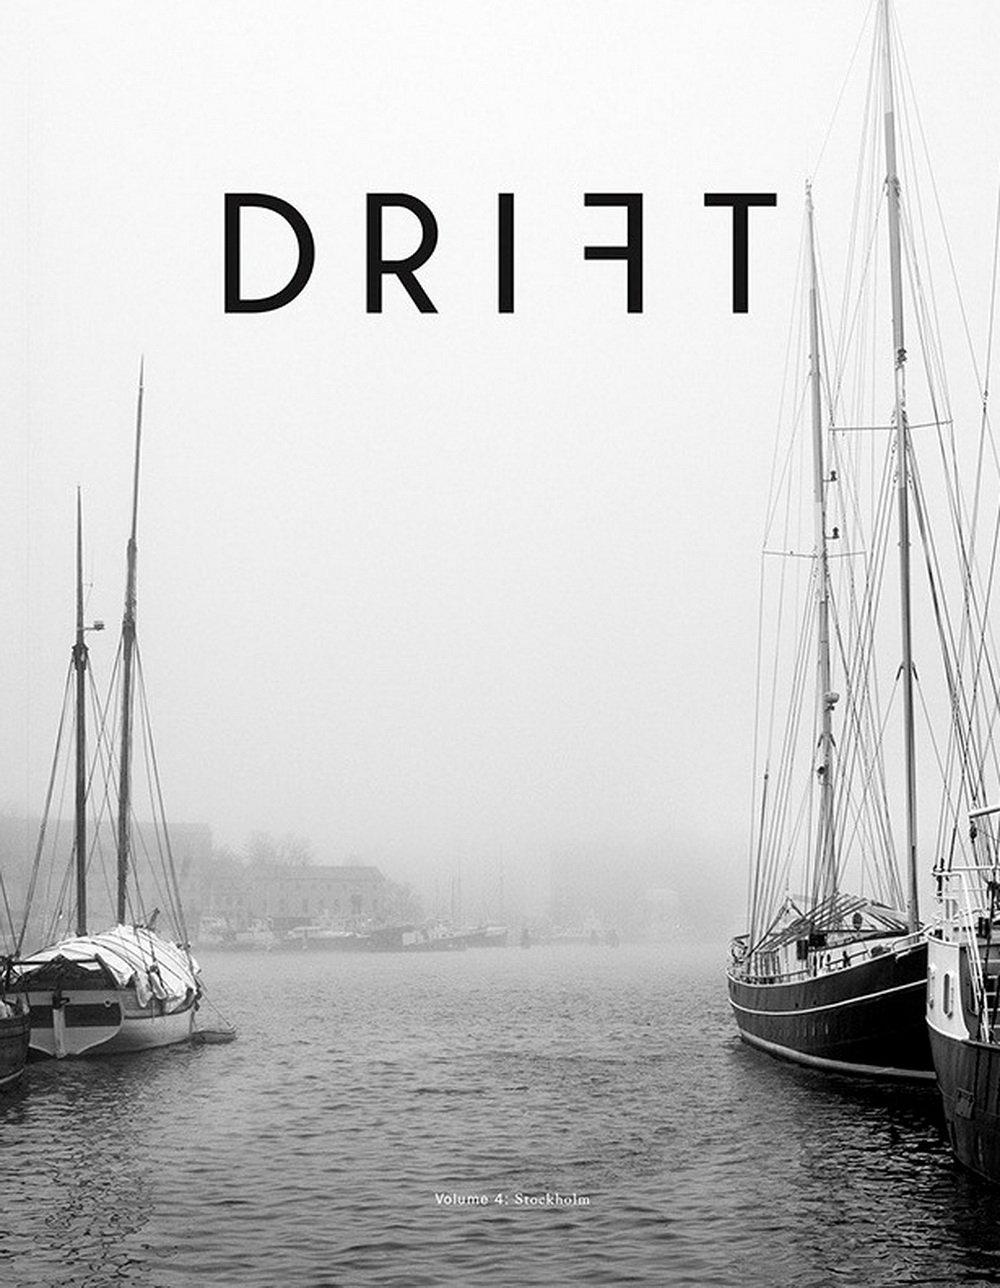 DRIFT Vol.4 : Stockholm